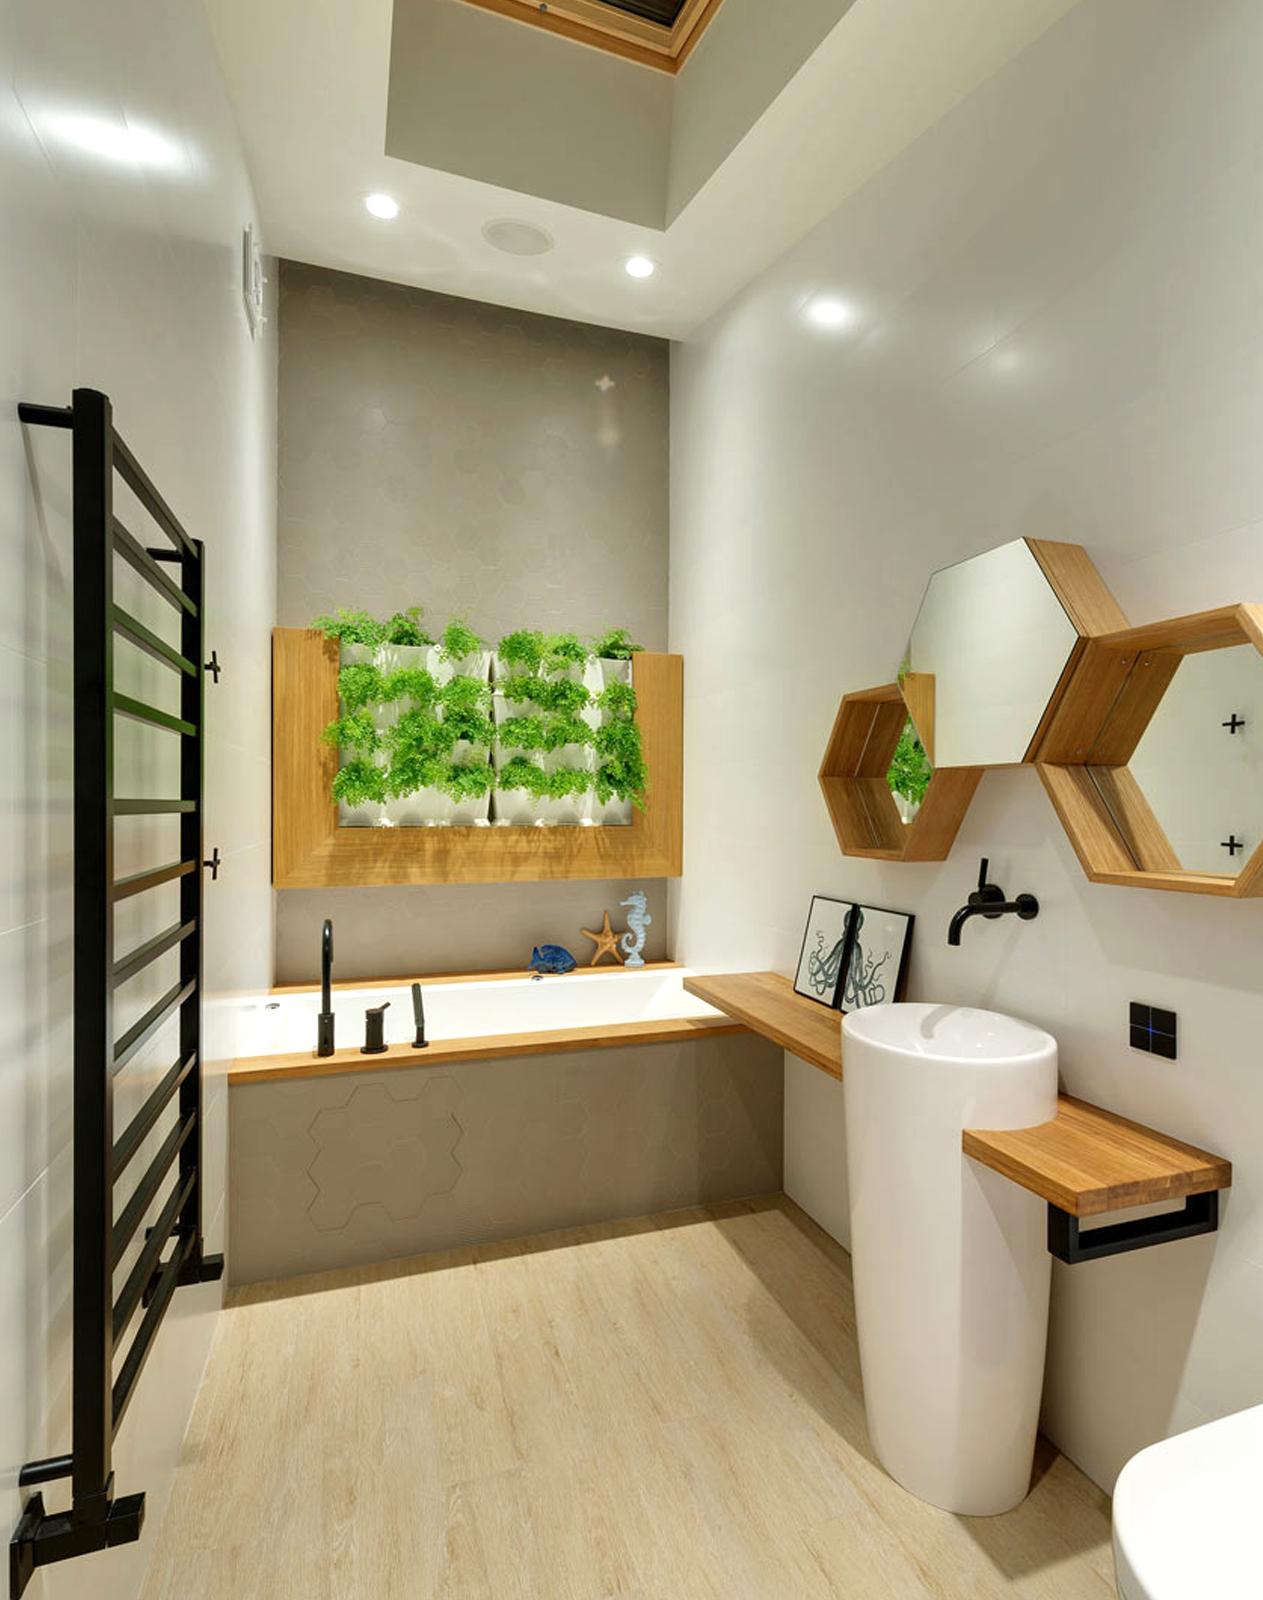 ki-design-studio-depa-resbaladilla-casa-8